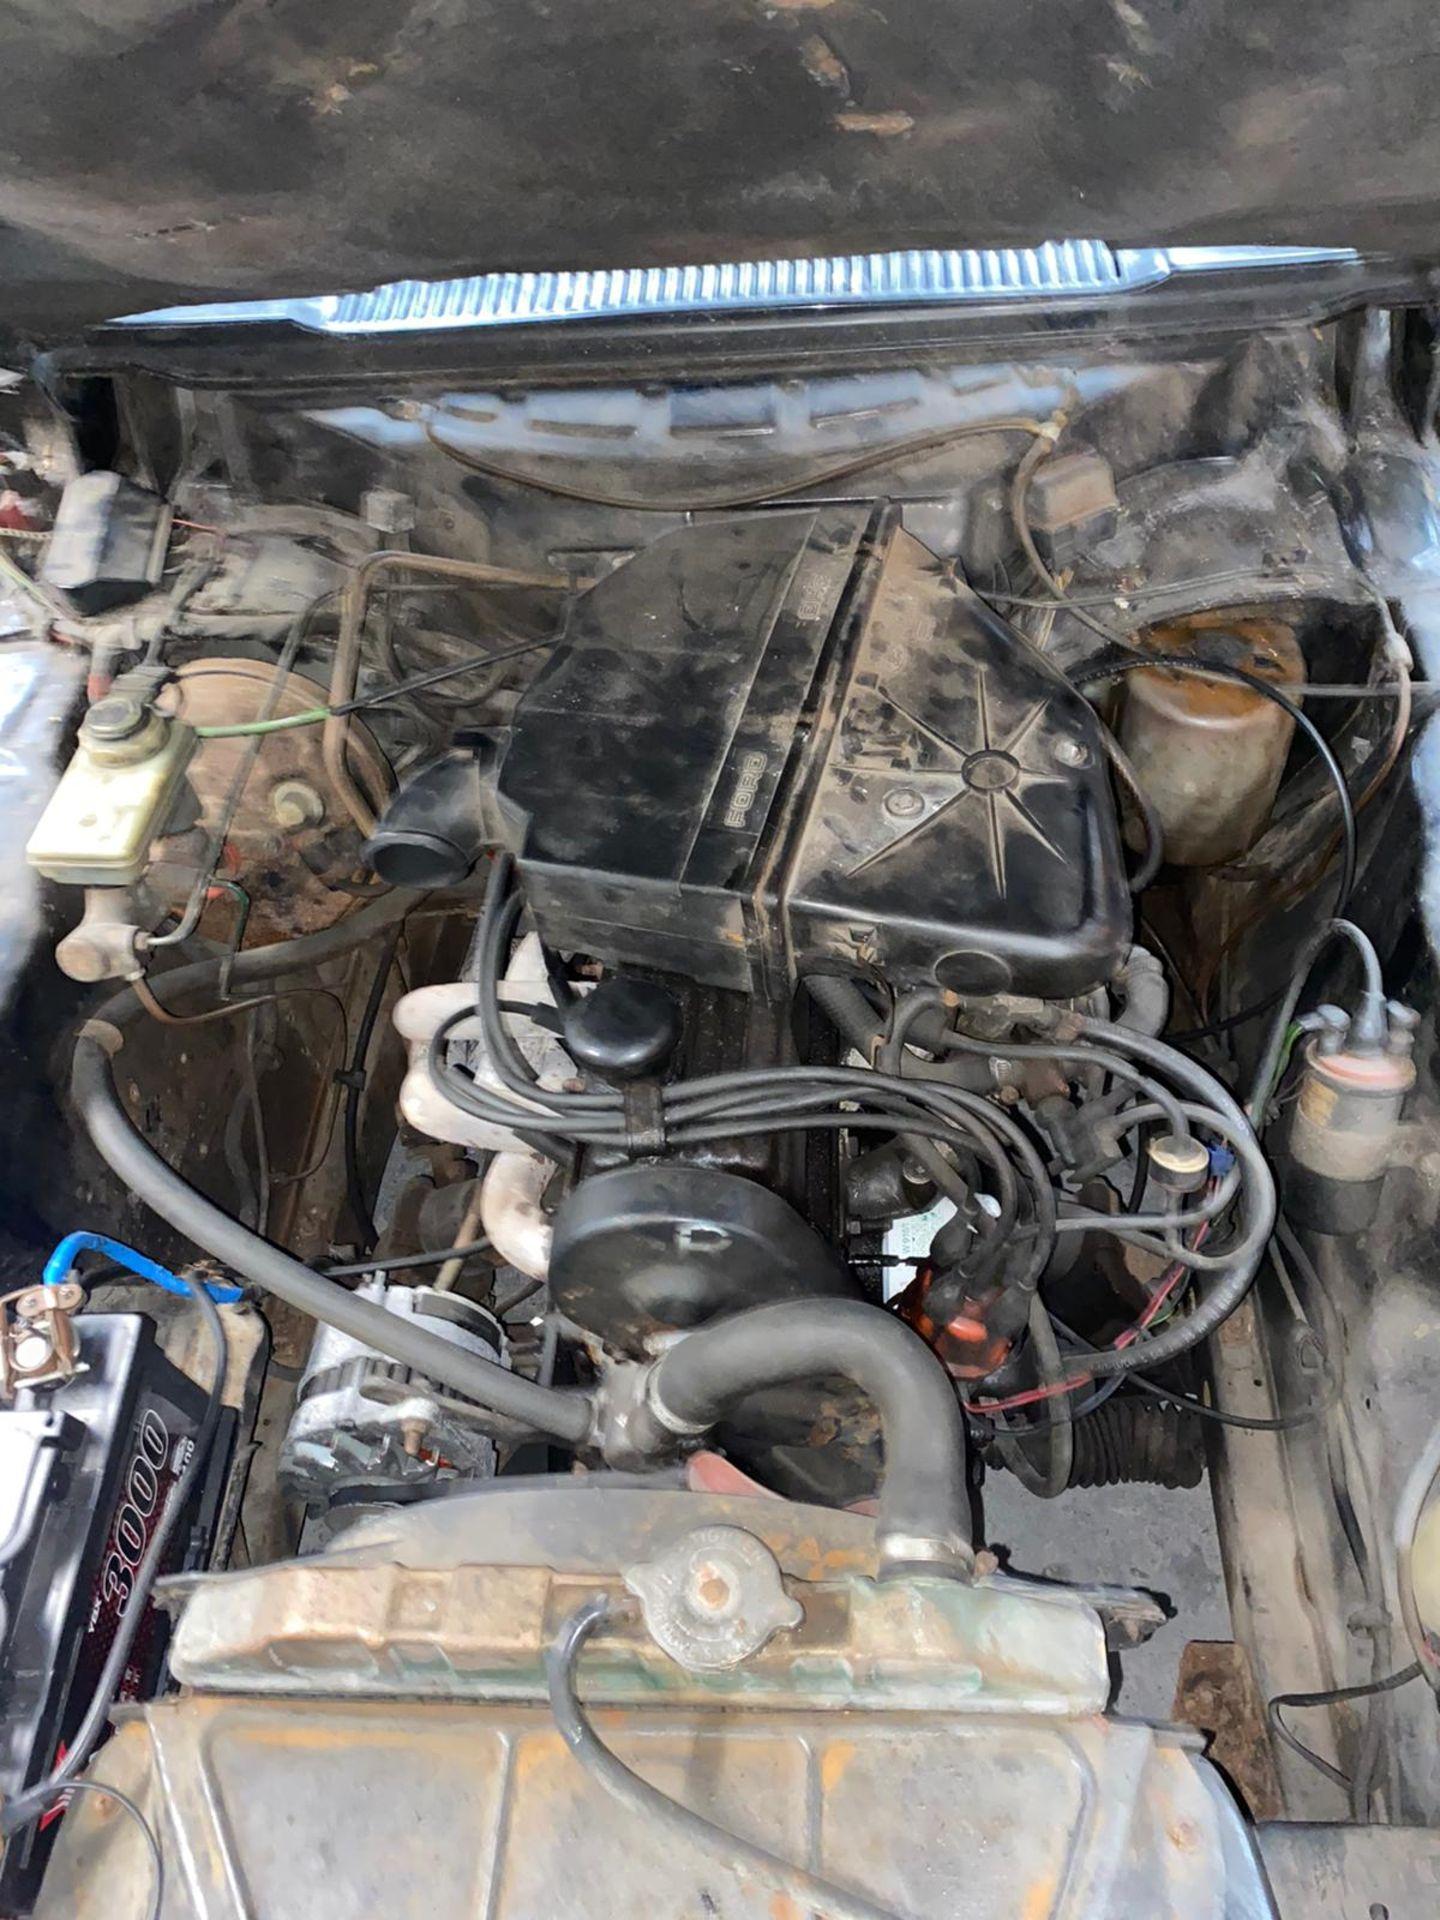 1986/C REG FORD CAPRI LASER AUTO 2.0 PETROL BLACK 3 DOOR *NO VAT* - Image 27 of 32